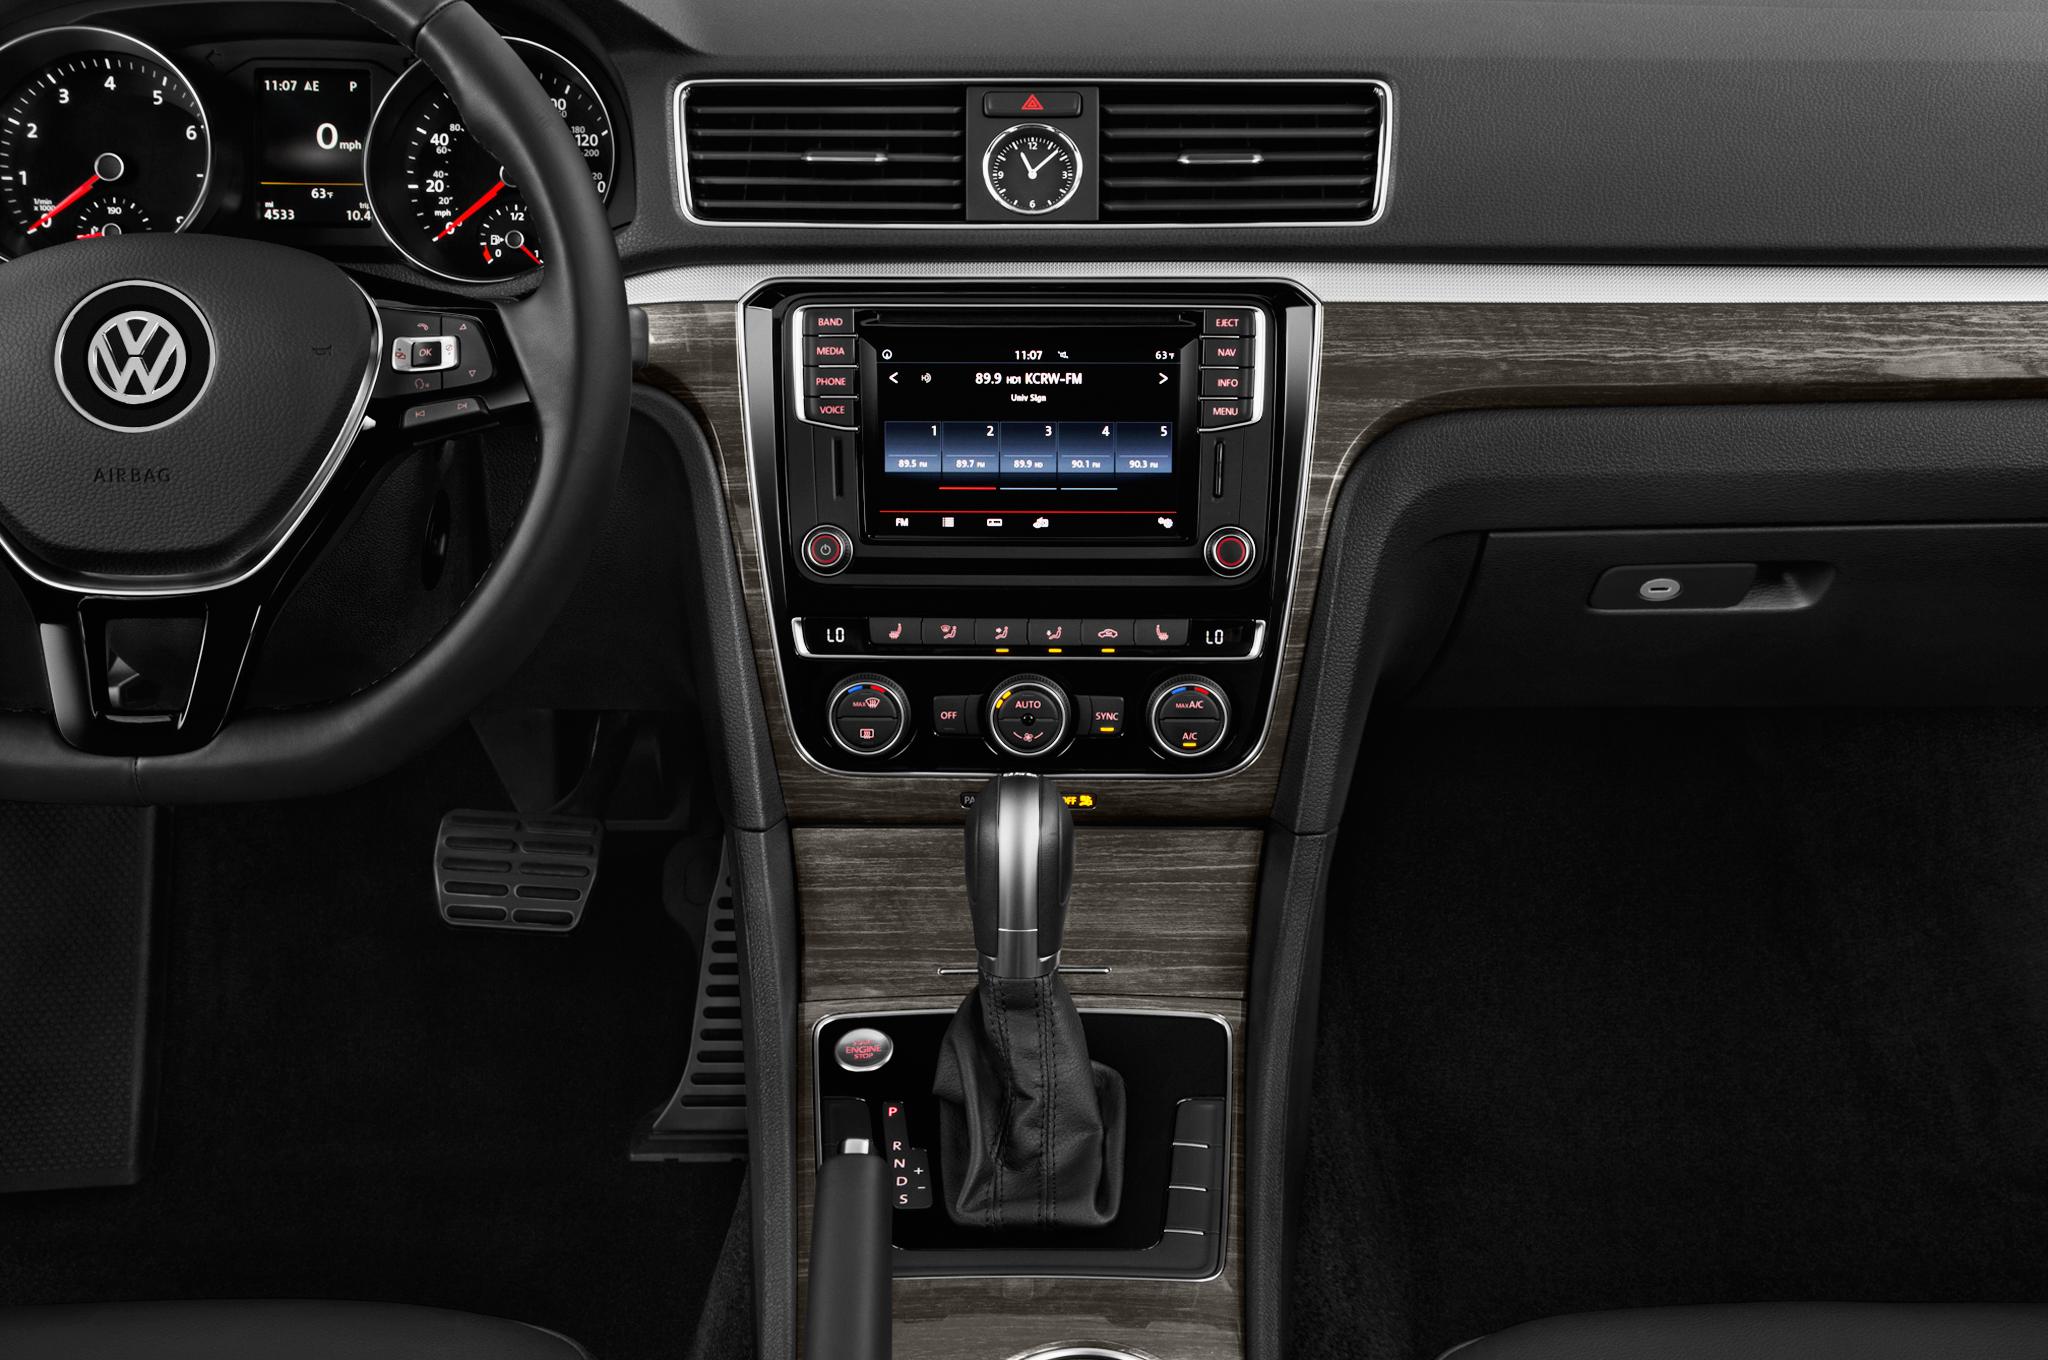 Volkswagen passat gt concept packs 280 horsepower automobile 1626 biocorpaavc Gallery